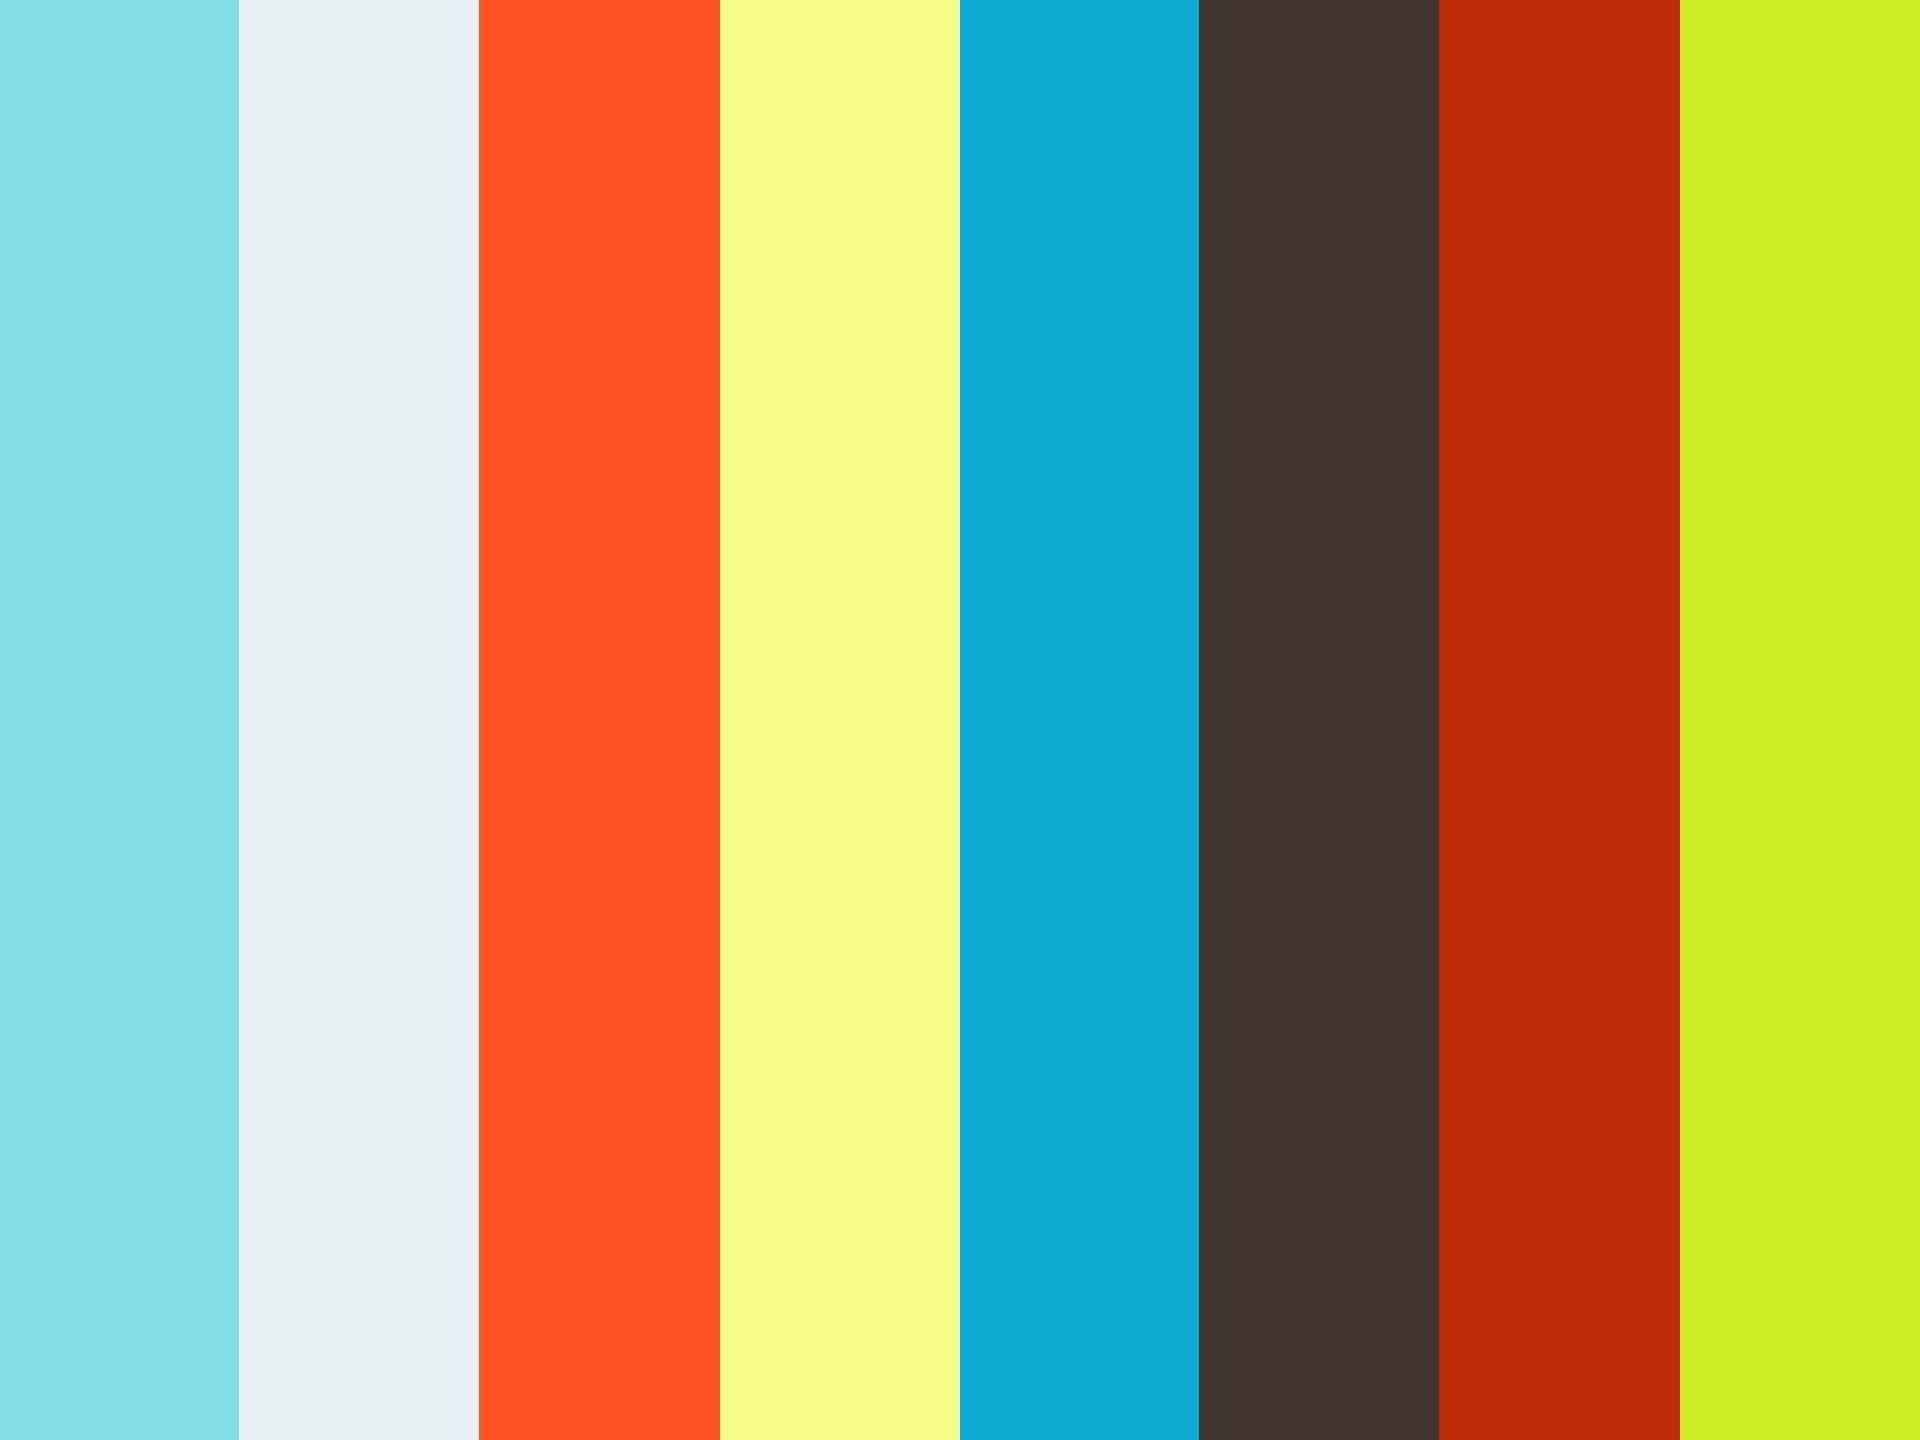 Edgar Leal - New Stories Composer